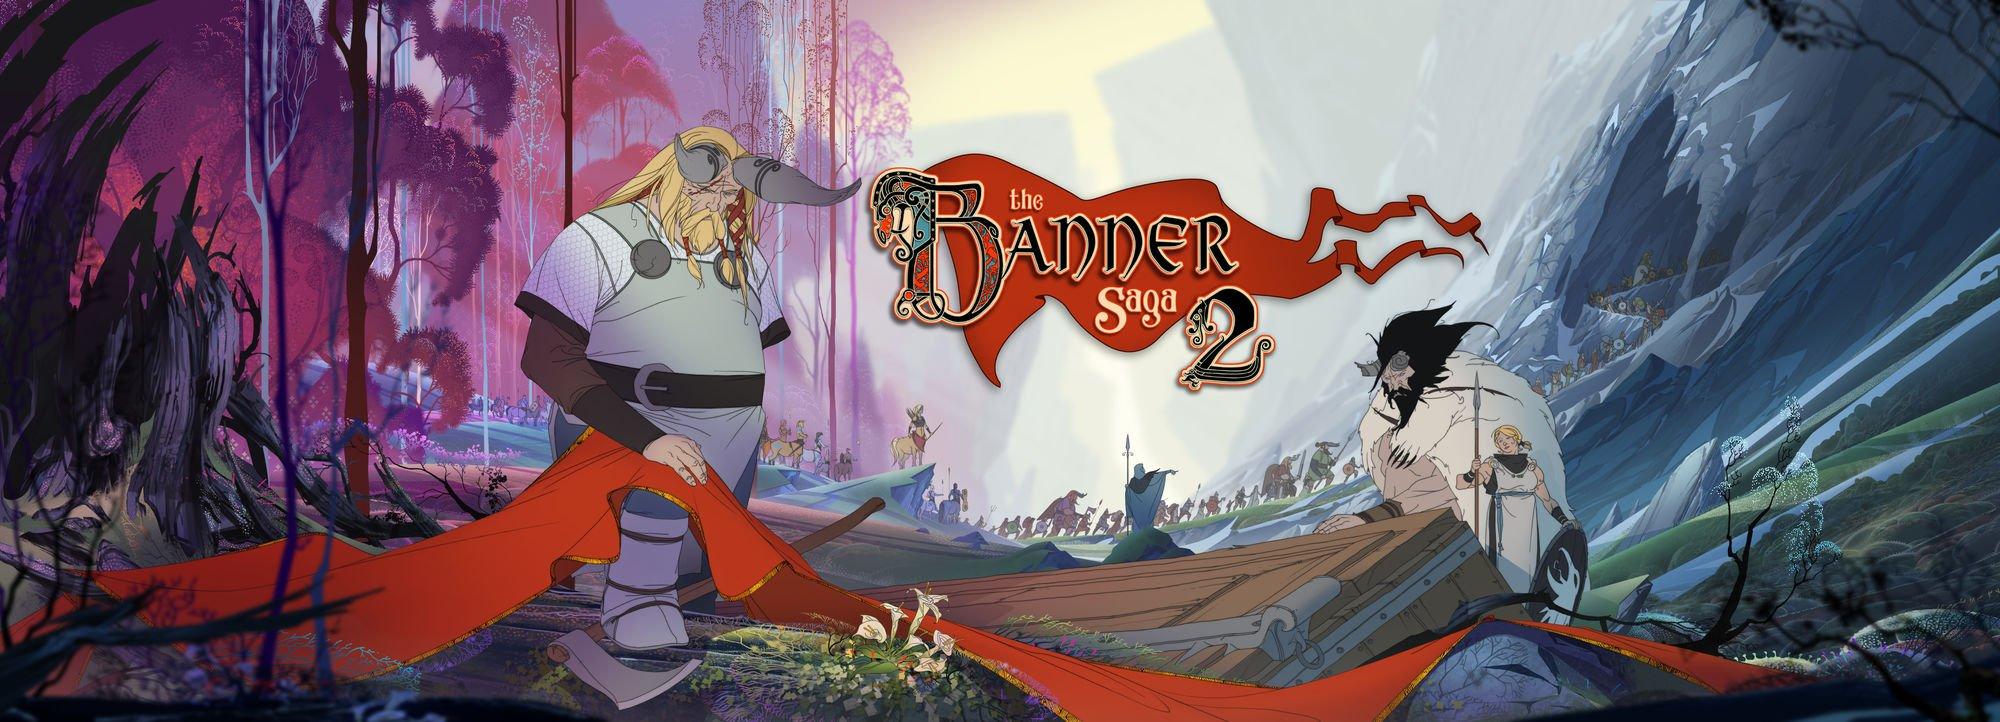 Пример саундтрека к The Banner Saga 2 от Остина Винтори. - Изображение 1